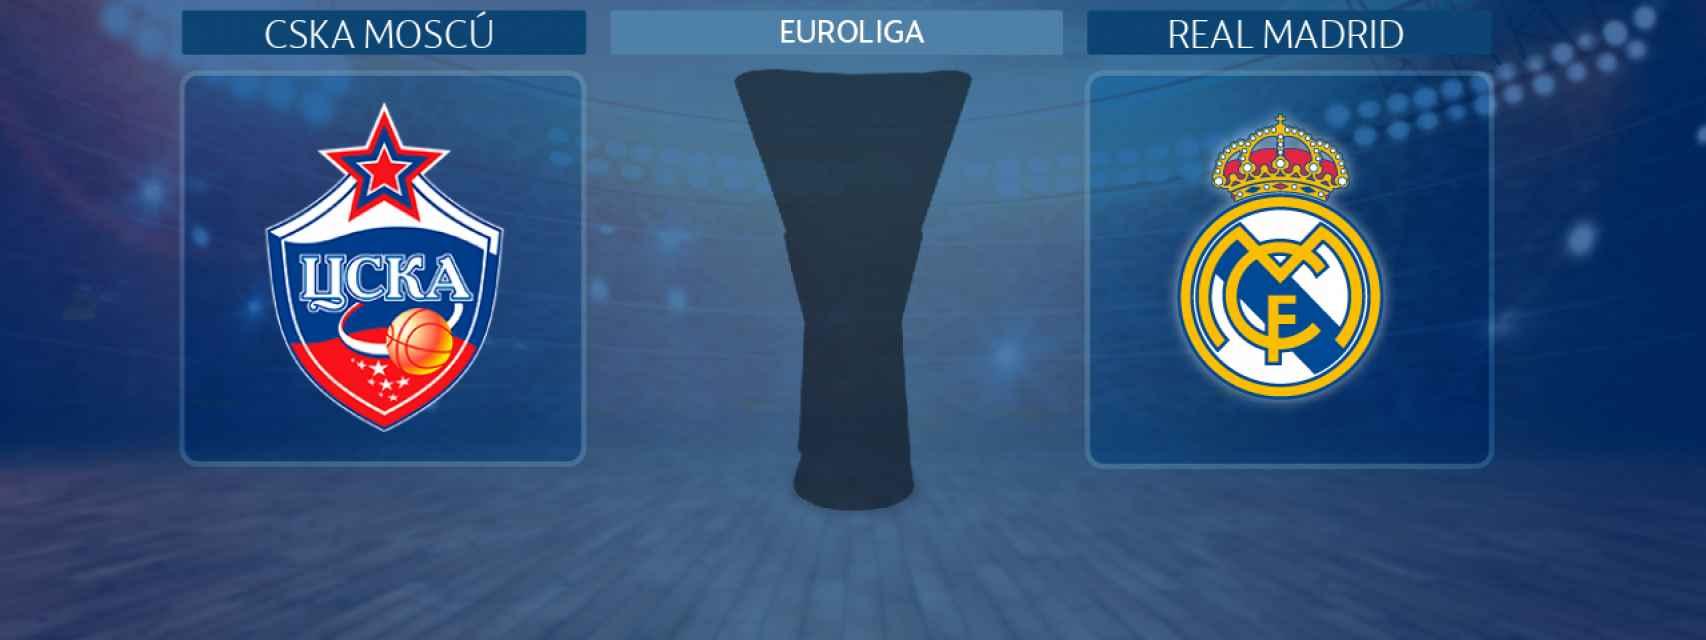 CSKA Moscú - Real Madrid, partido de la Euroliga